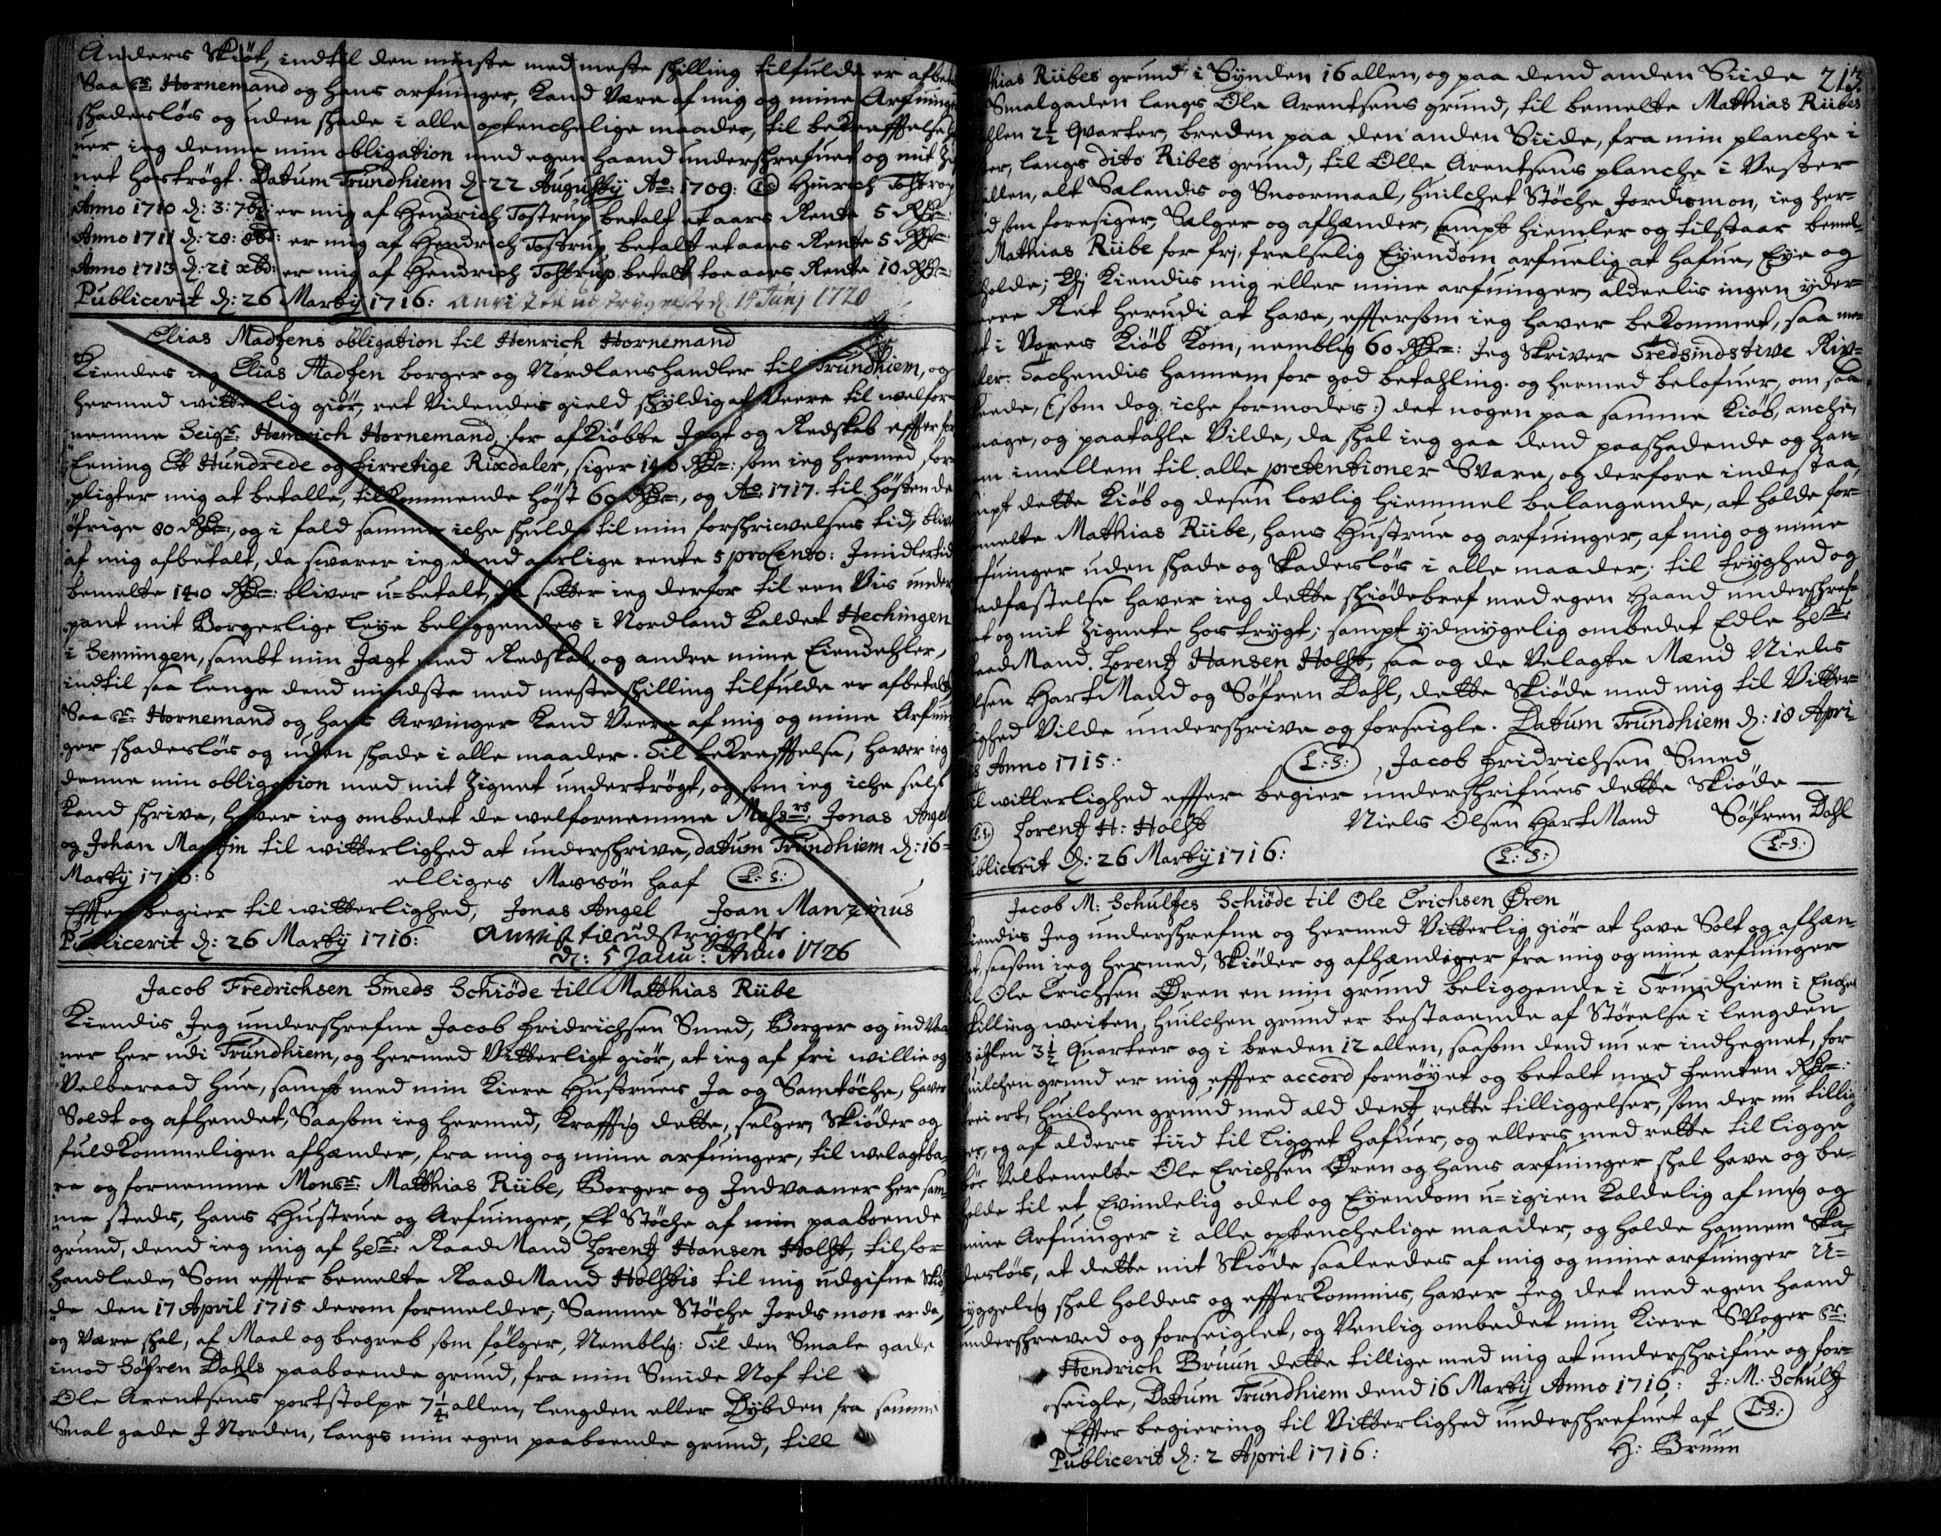 SAT, Trondheim byfogd, 2/2C/L0005: Mortgage book no. 3, 1709-1720, p. 213